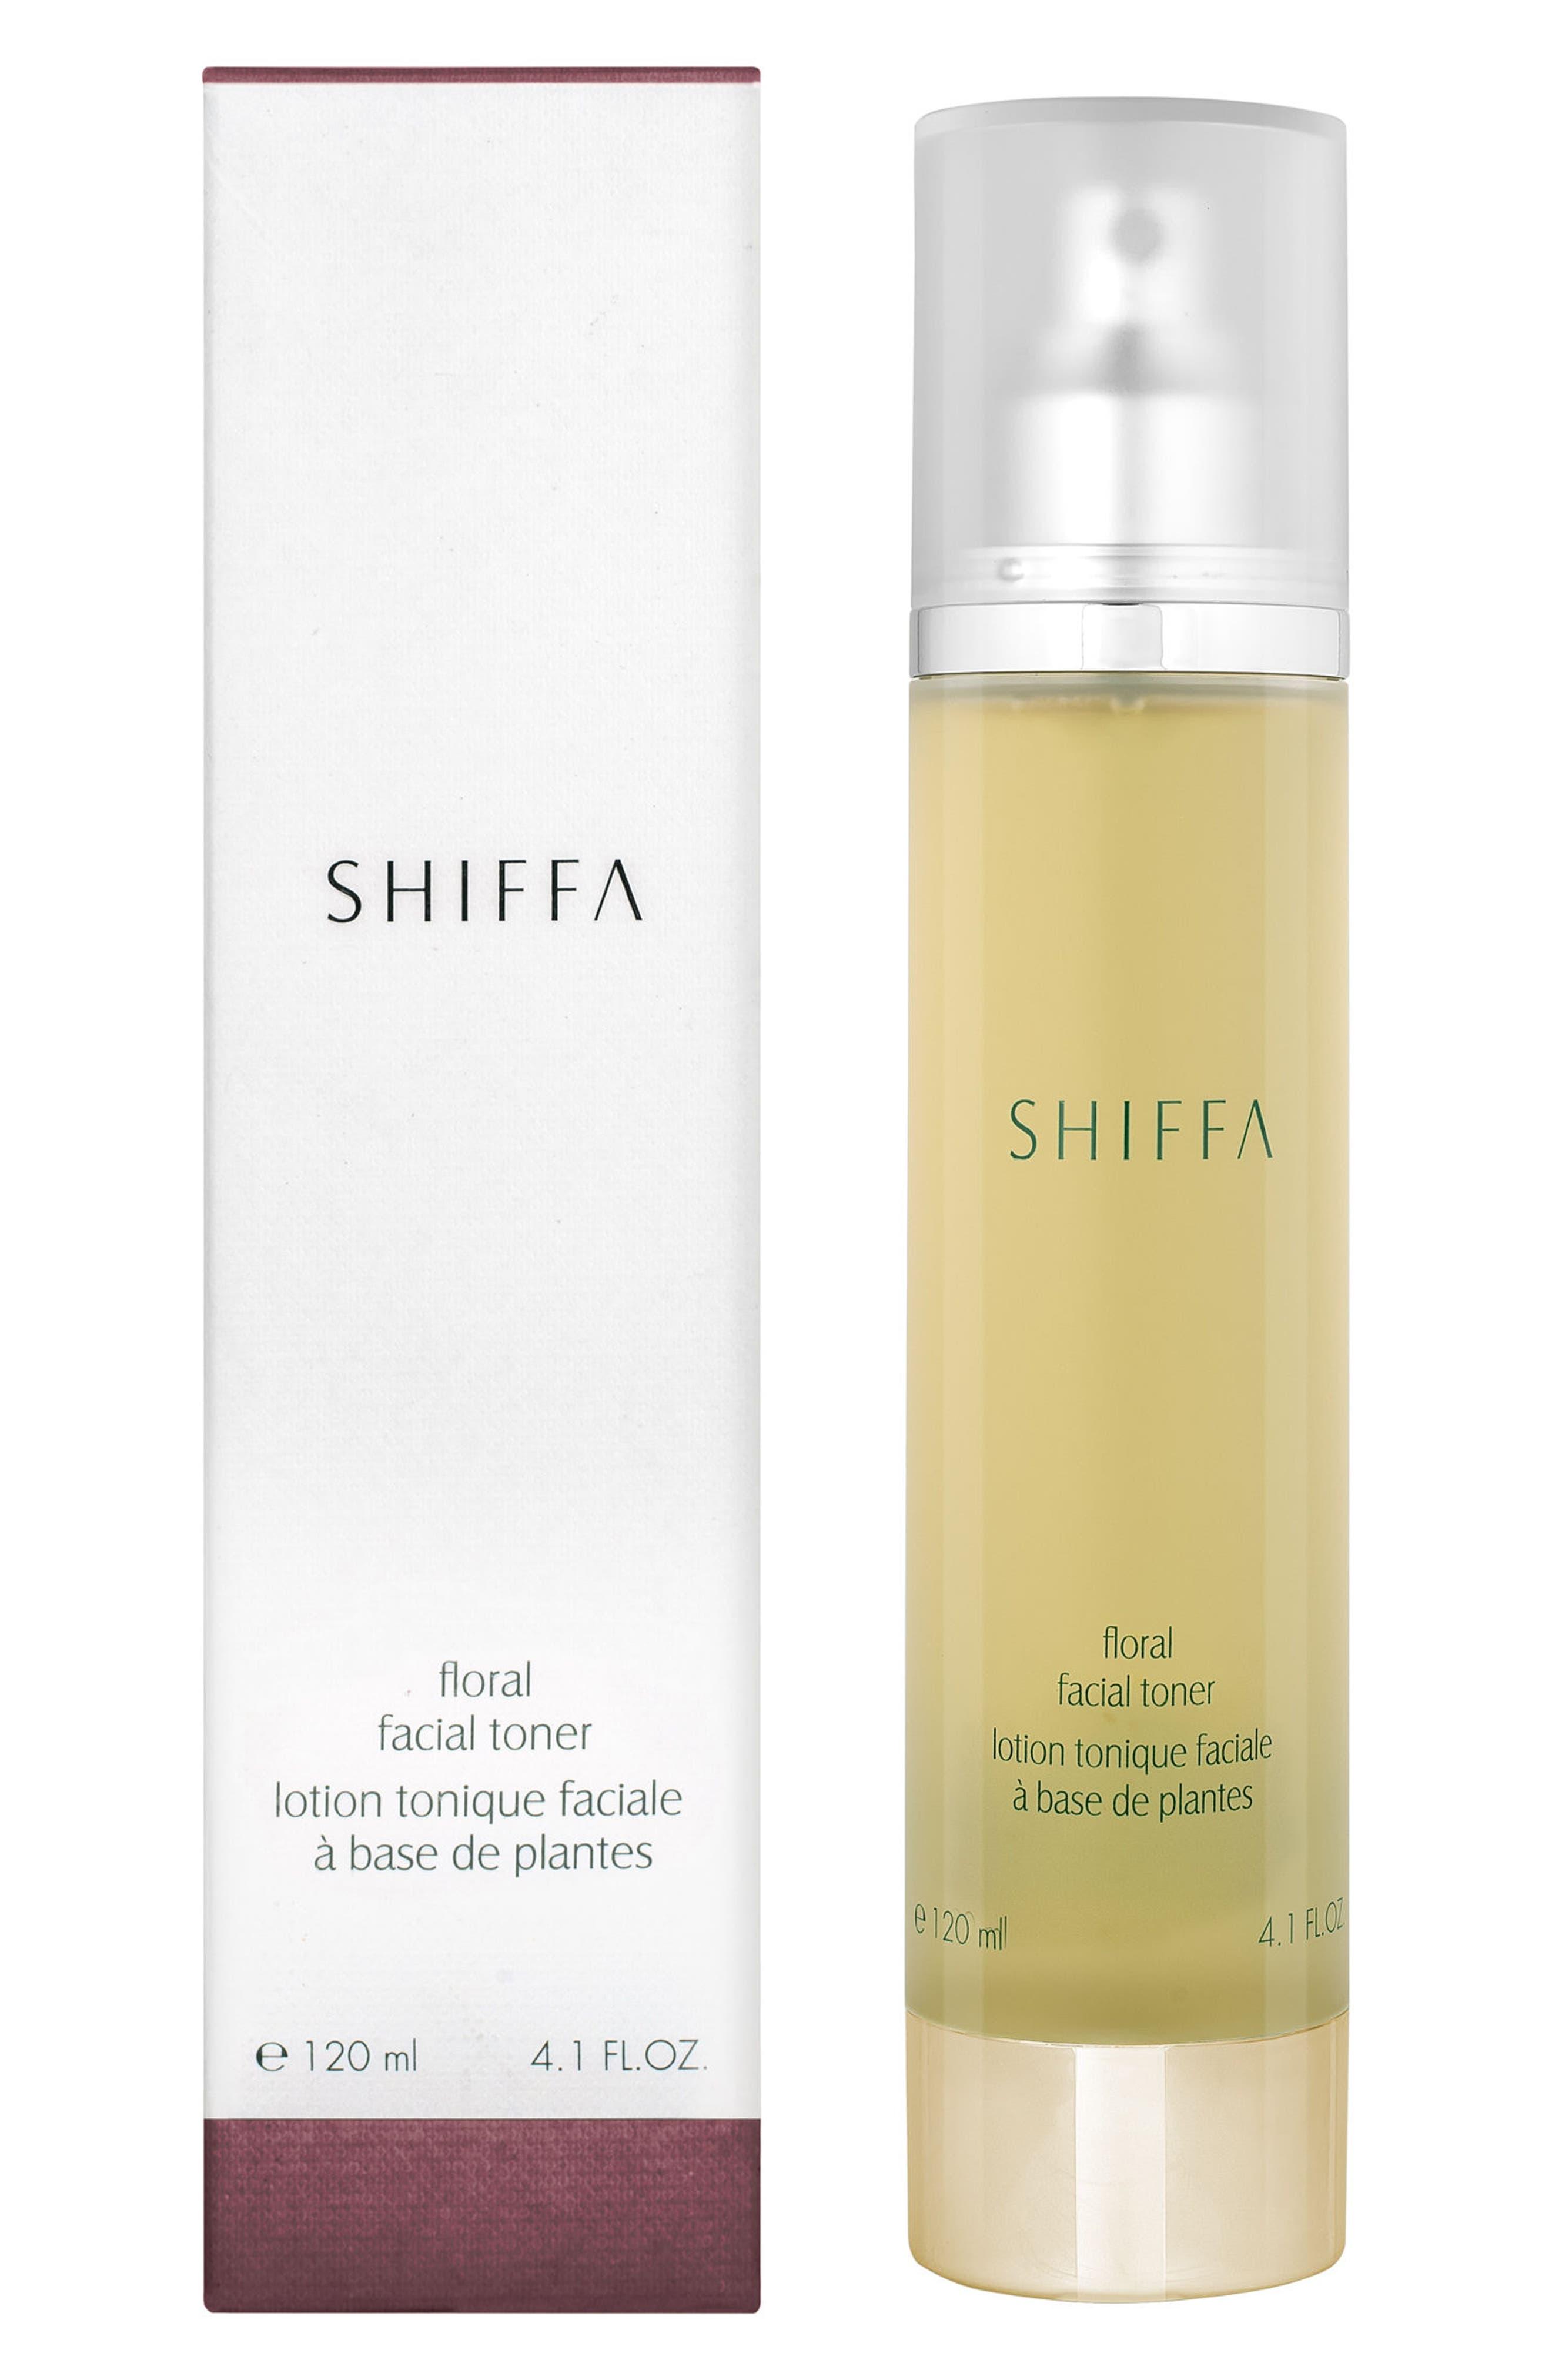 Shiffa Floral Facial Toner